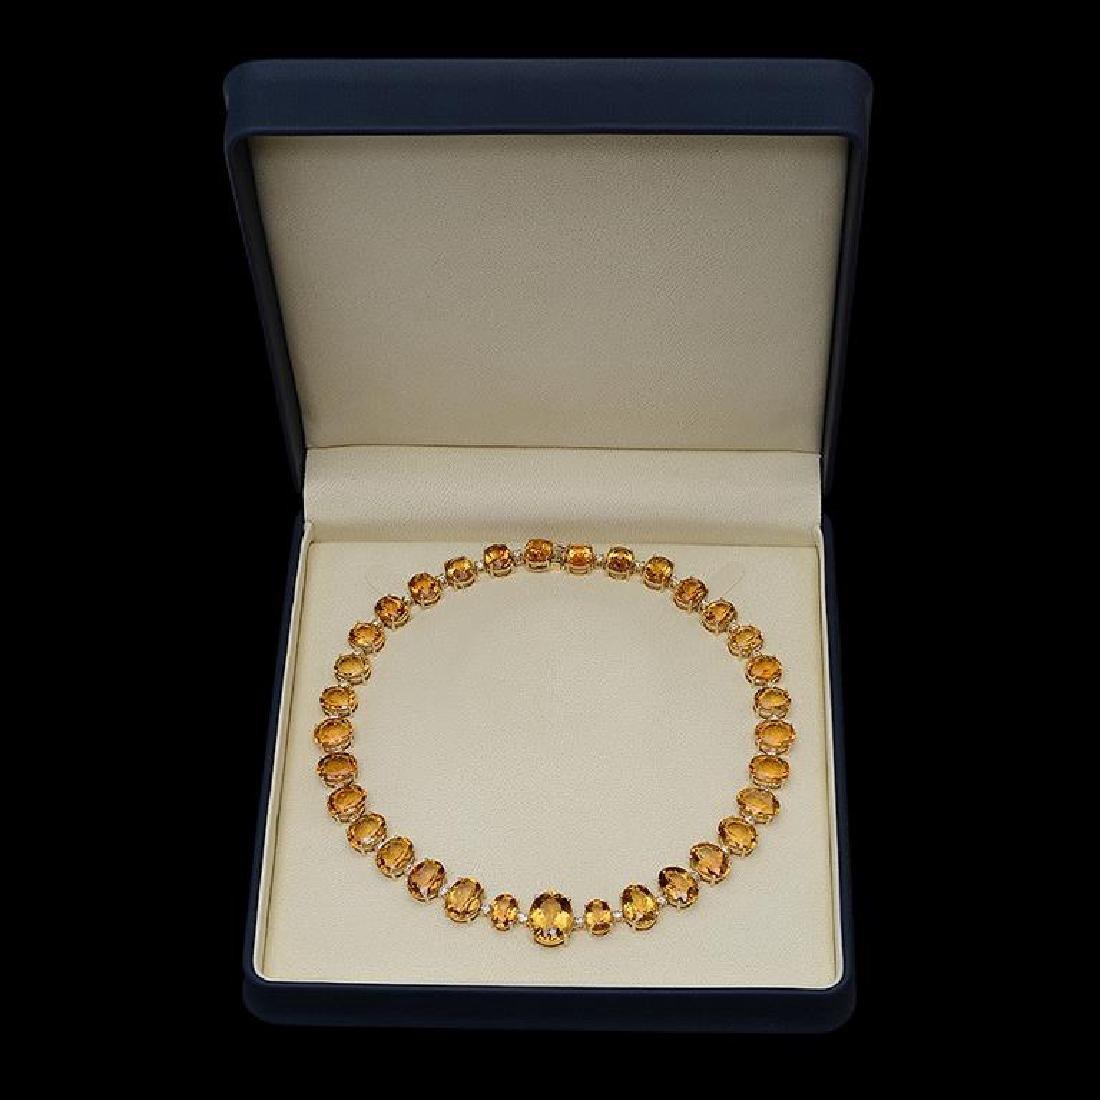 14K Gold 152.53ct Citrine & 4.10ct Diamond Necklace - 2